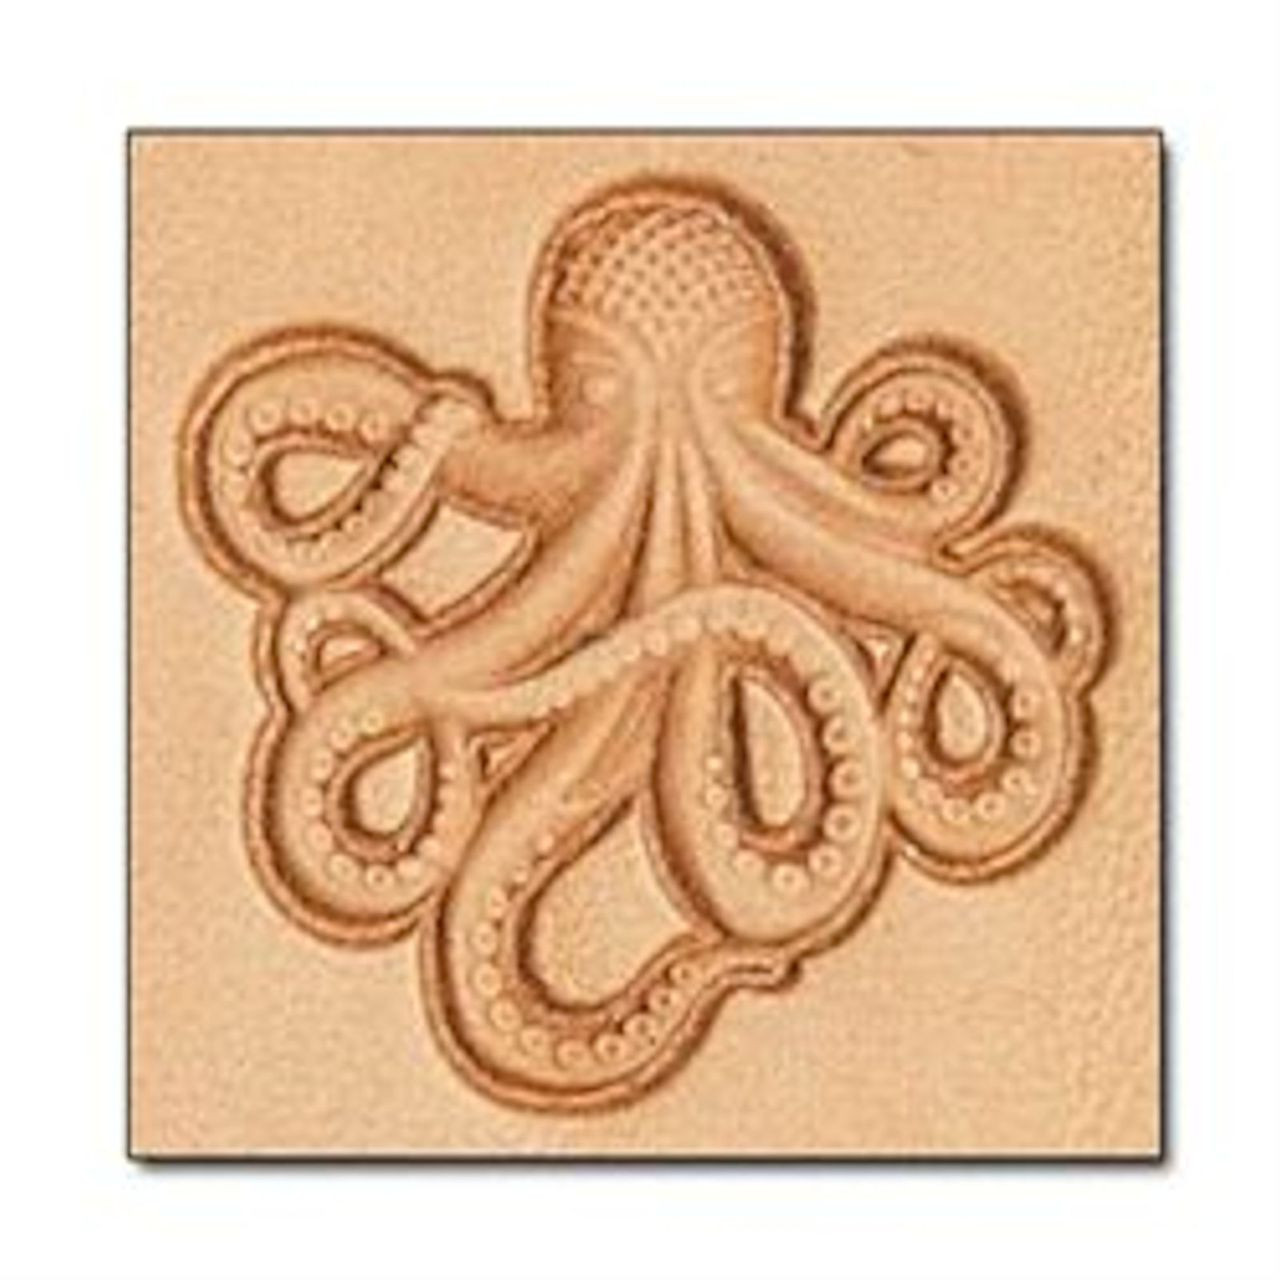 Craftool 3D Octopus Stamp 8674 00